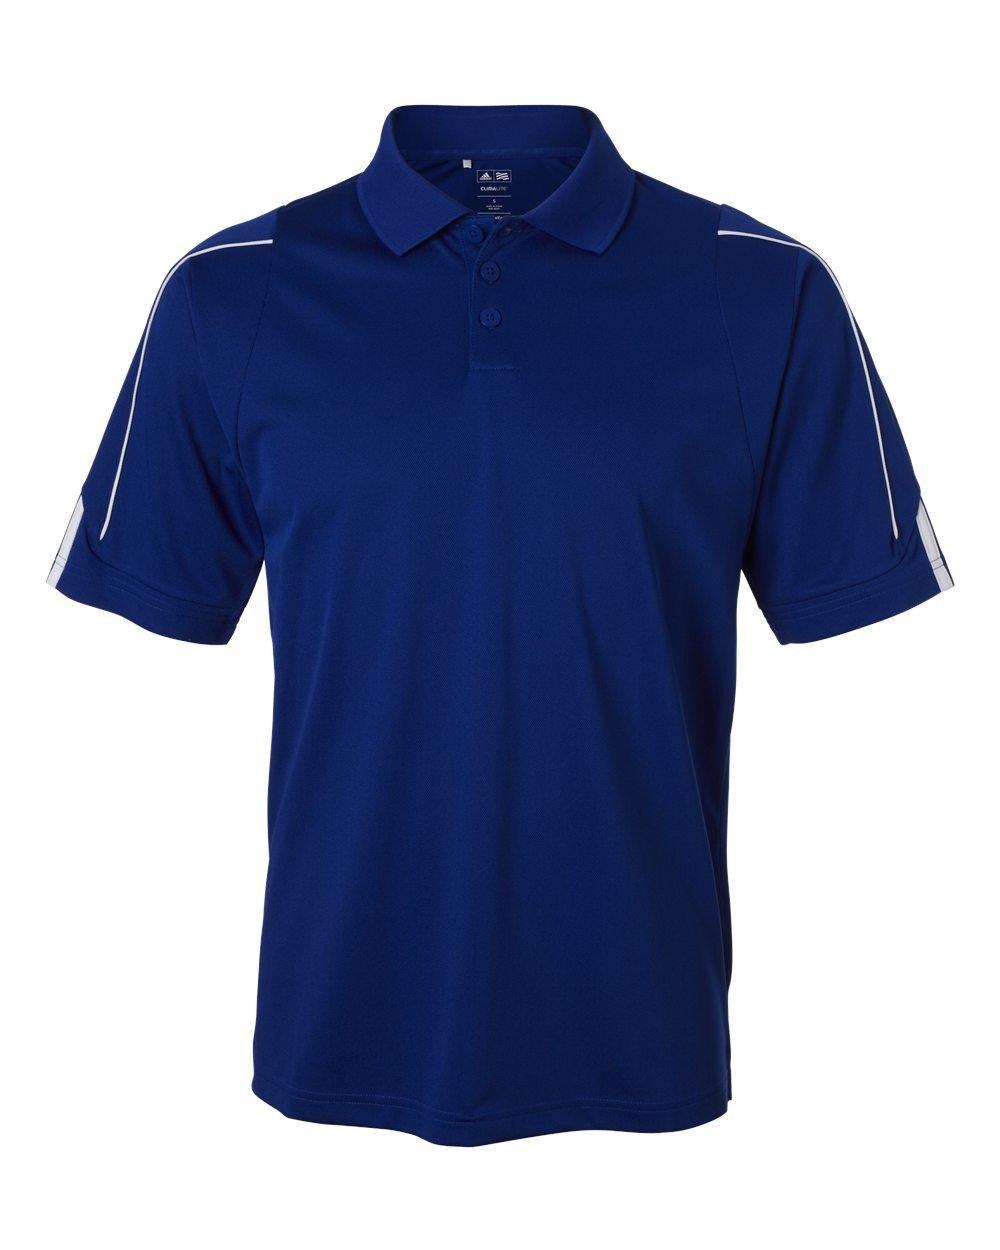 Adidas Men's ClimaLite 3 Stripes Cuff Polo Shirt, Small, COLLEGIATE ROYAL/WHITE